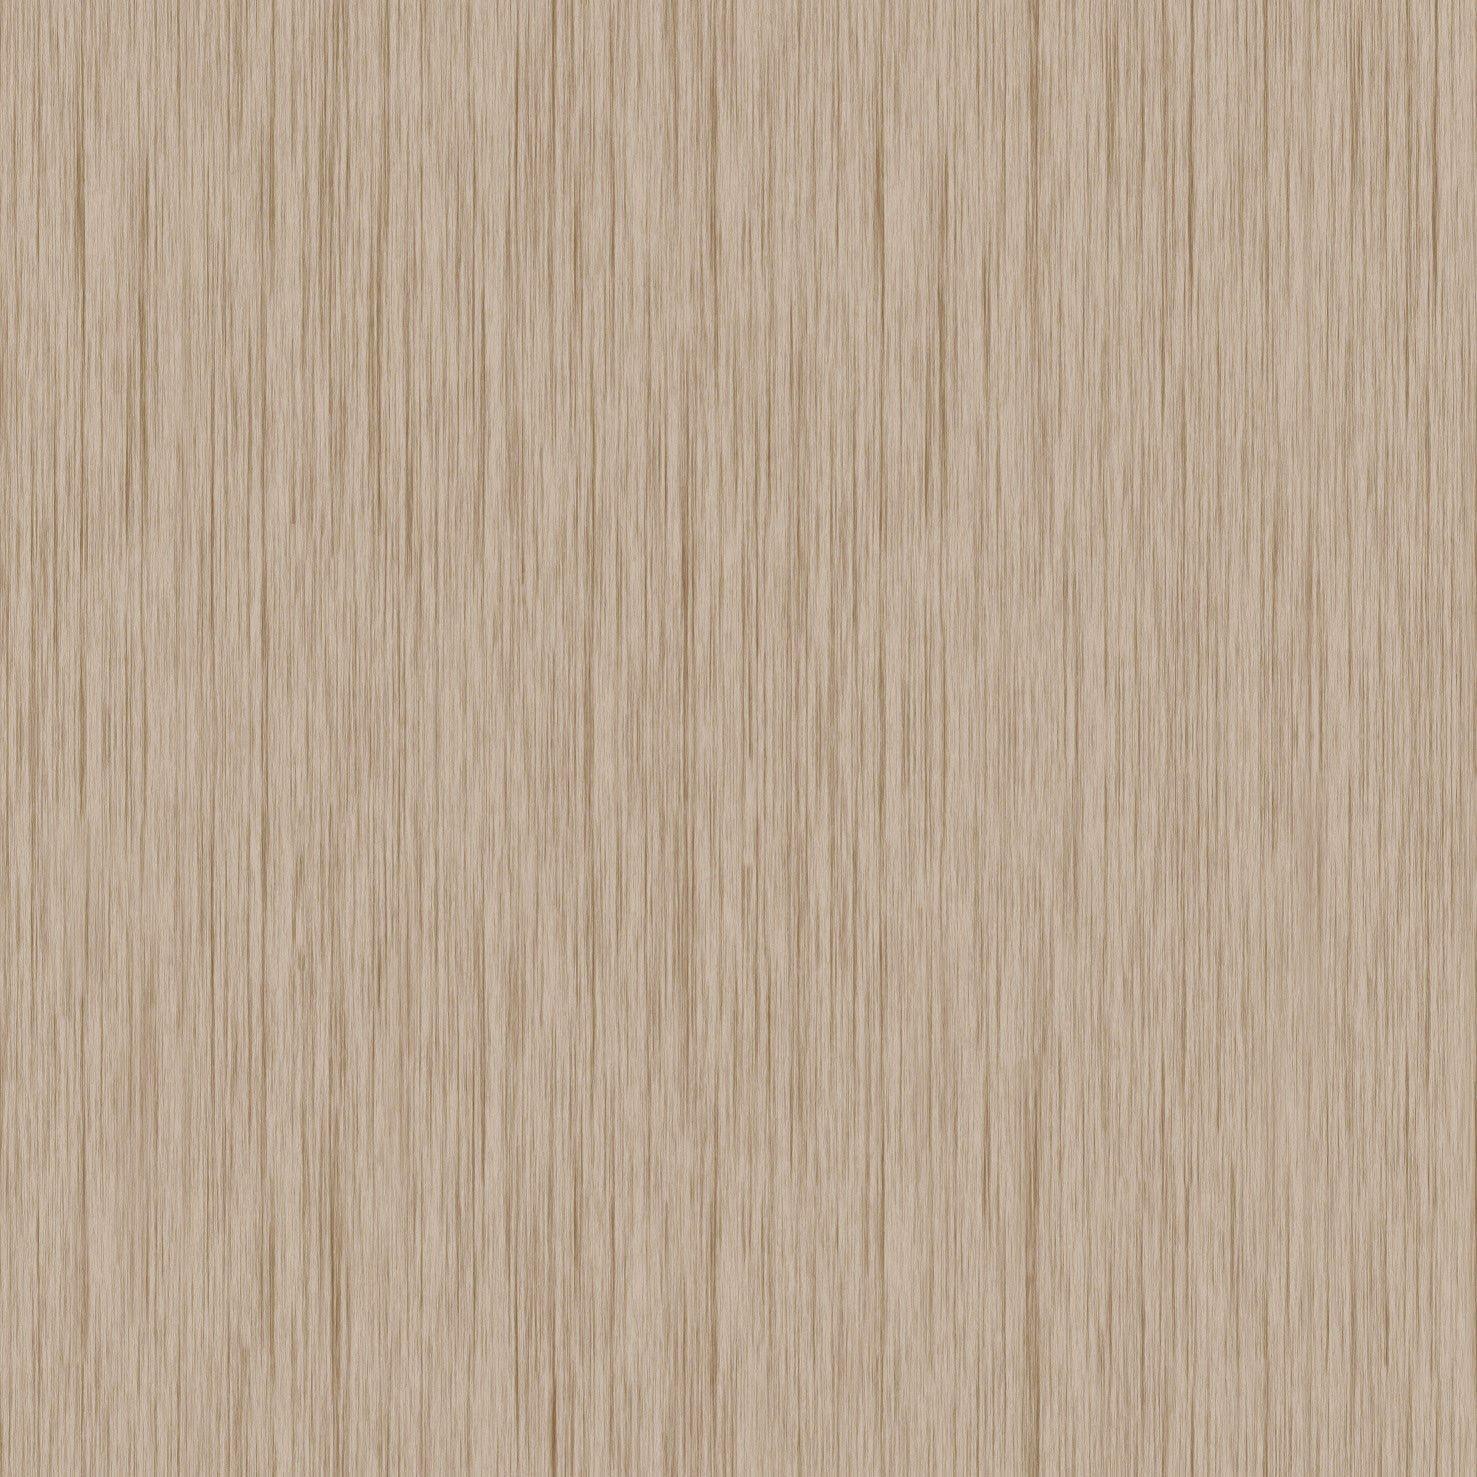 Texture Seamless Legno Vari Colori Legno Textures Colori